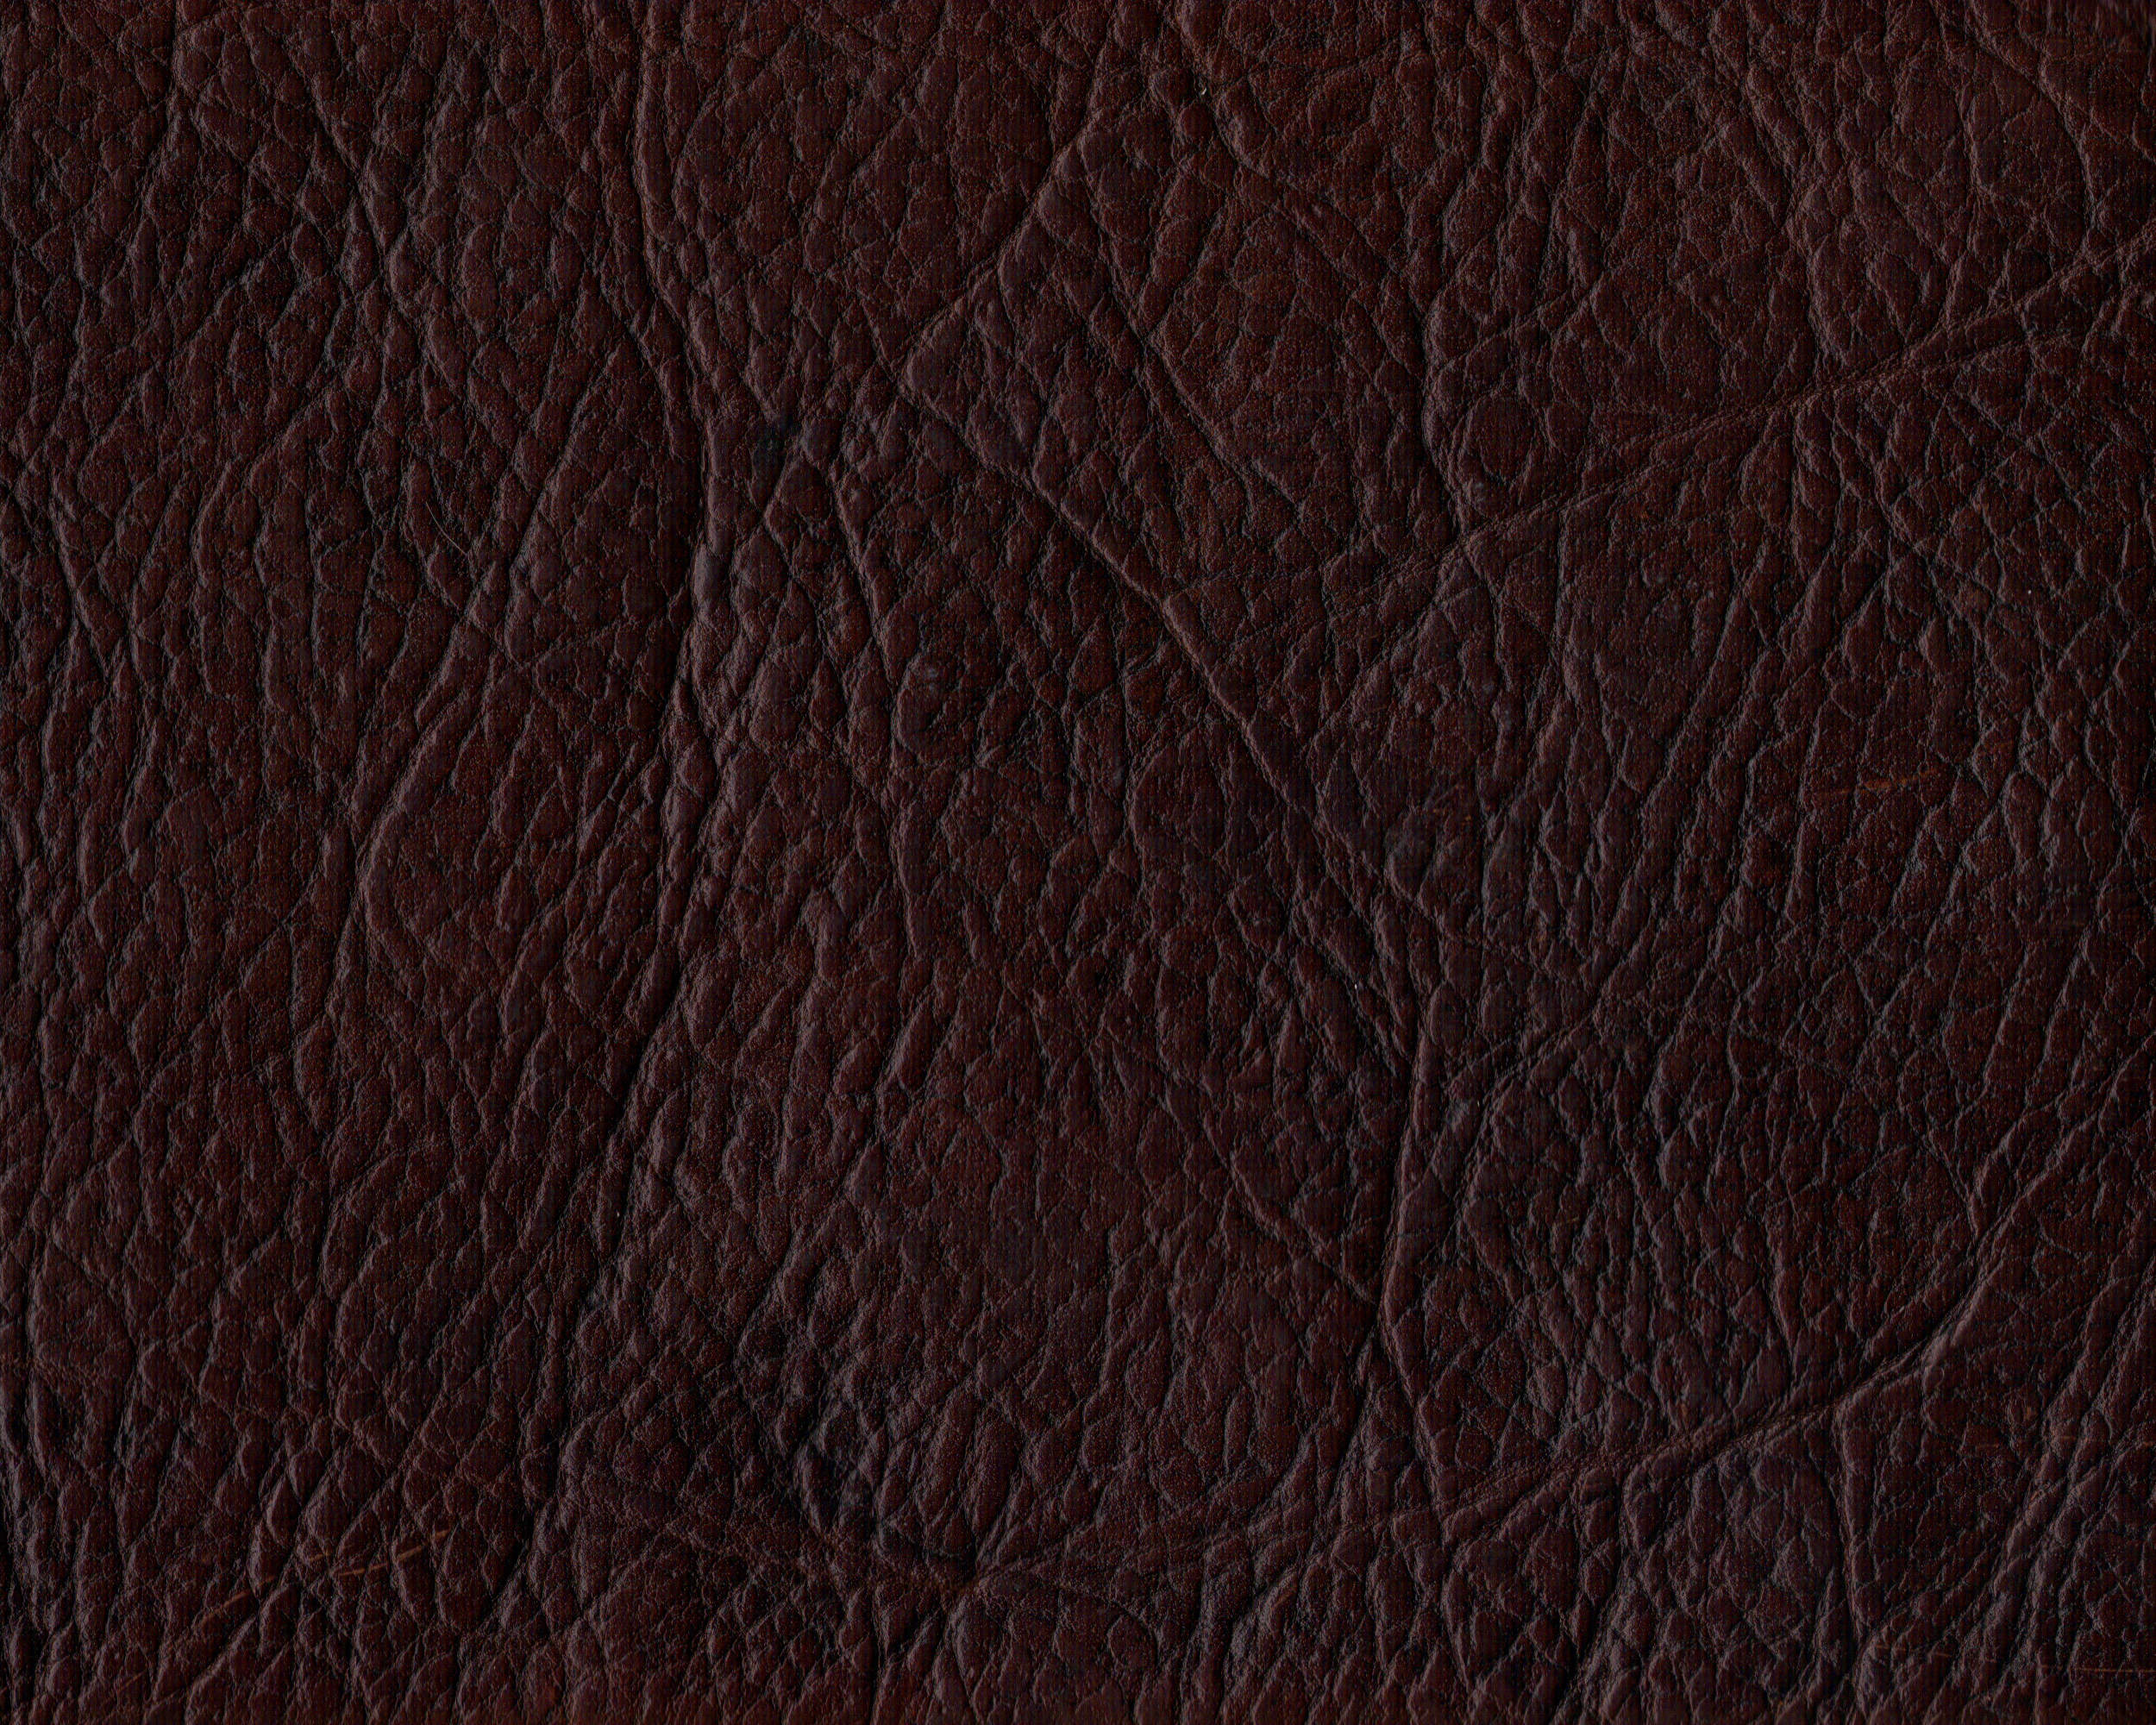 Dark Brown Leather Textures Jpg Onlygfx Com